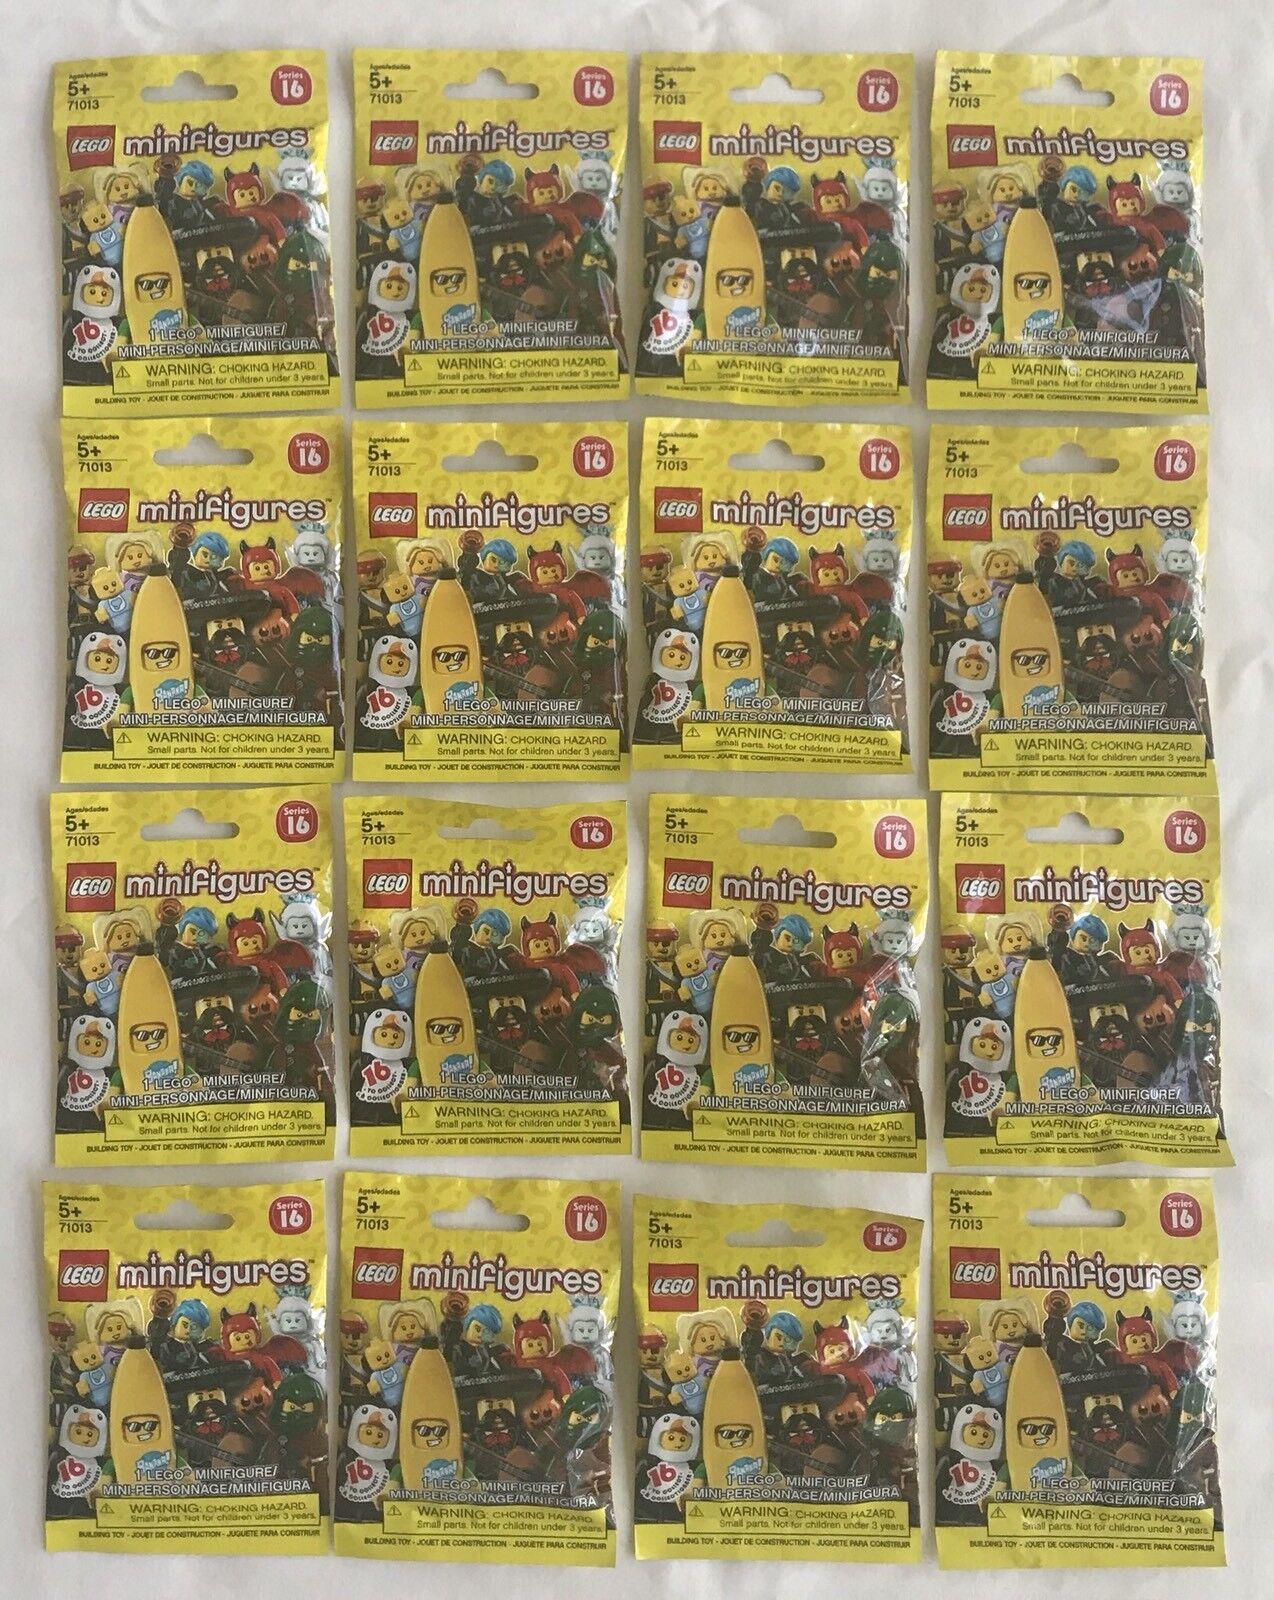 LEGO MINIFIGURES MINIFIGURES MINIFIGURES (71013) - Series 16 -COMPLETE SET of 16 Figures - New & SEALED  c418c1